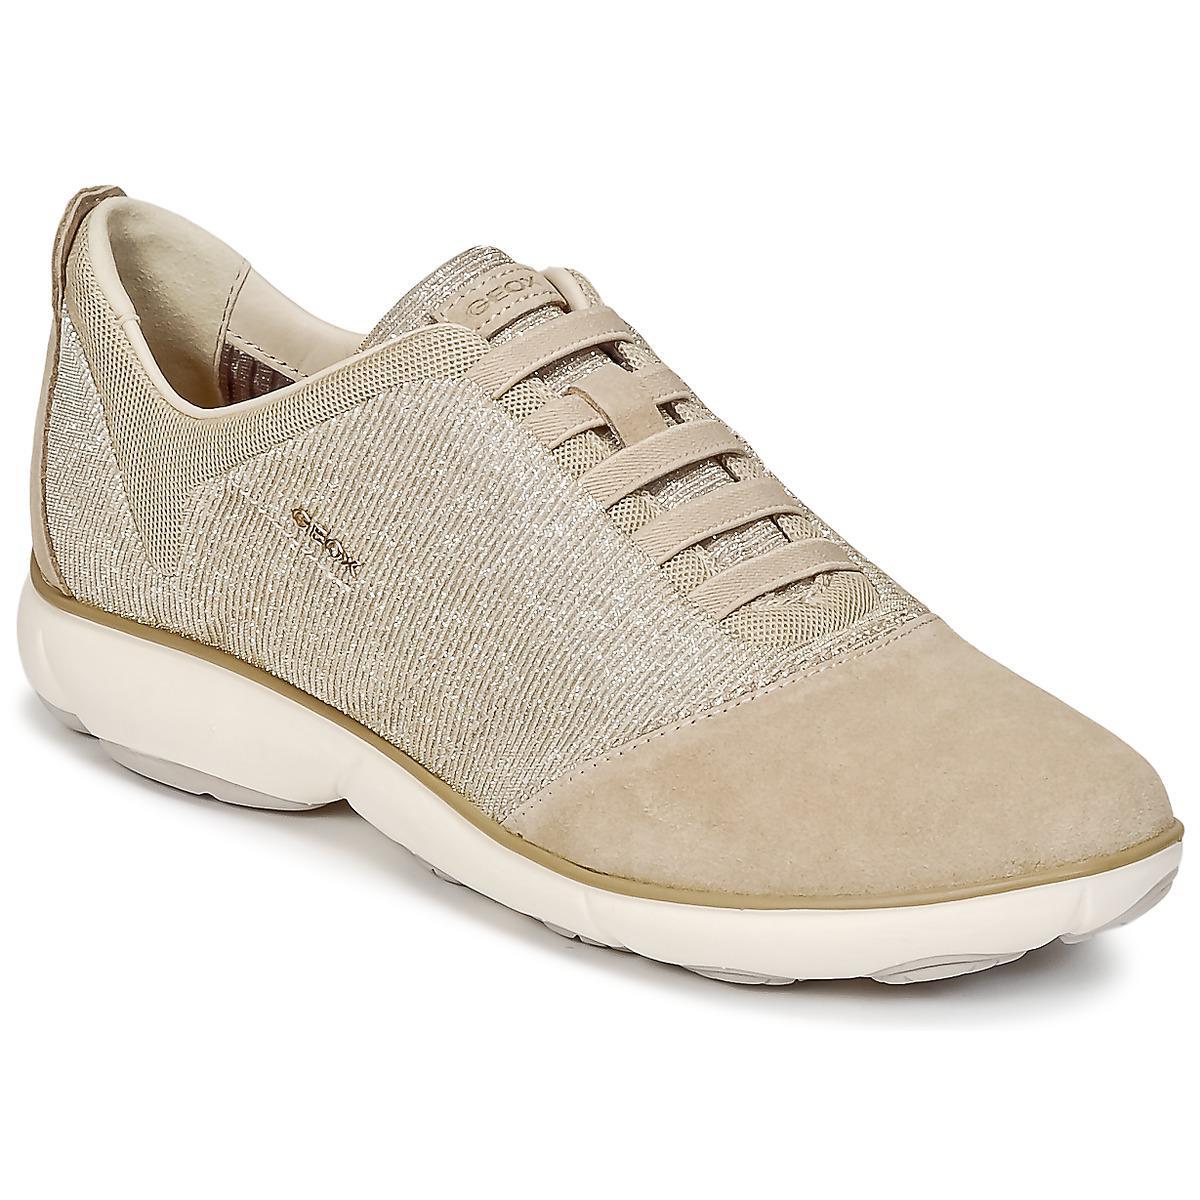 e8817e7c60c88 Geox D Nebula G Women s Shoes (trainers) In Beige in Natural - Lyst